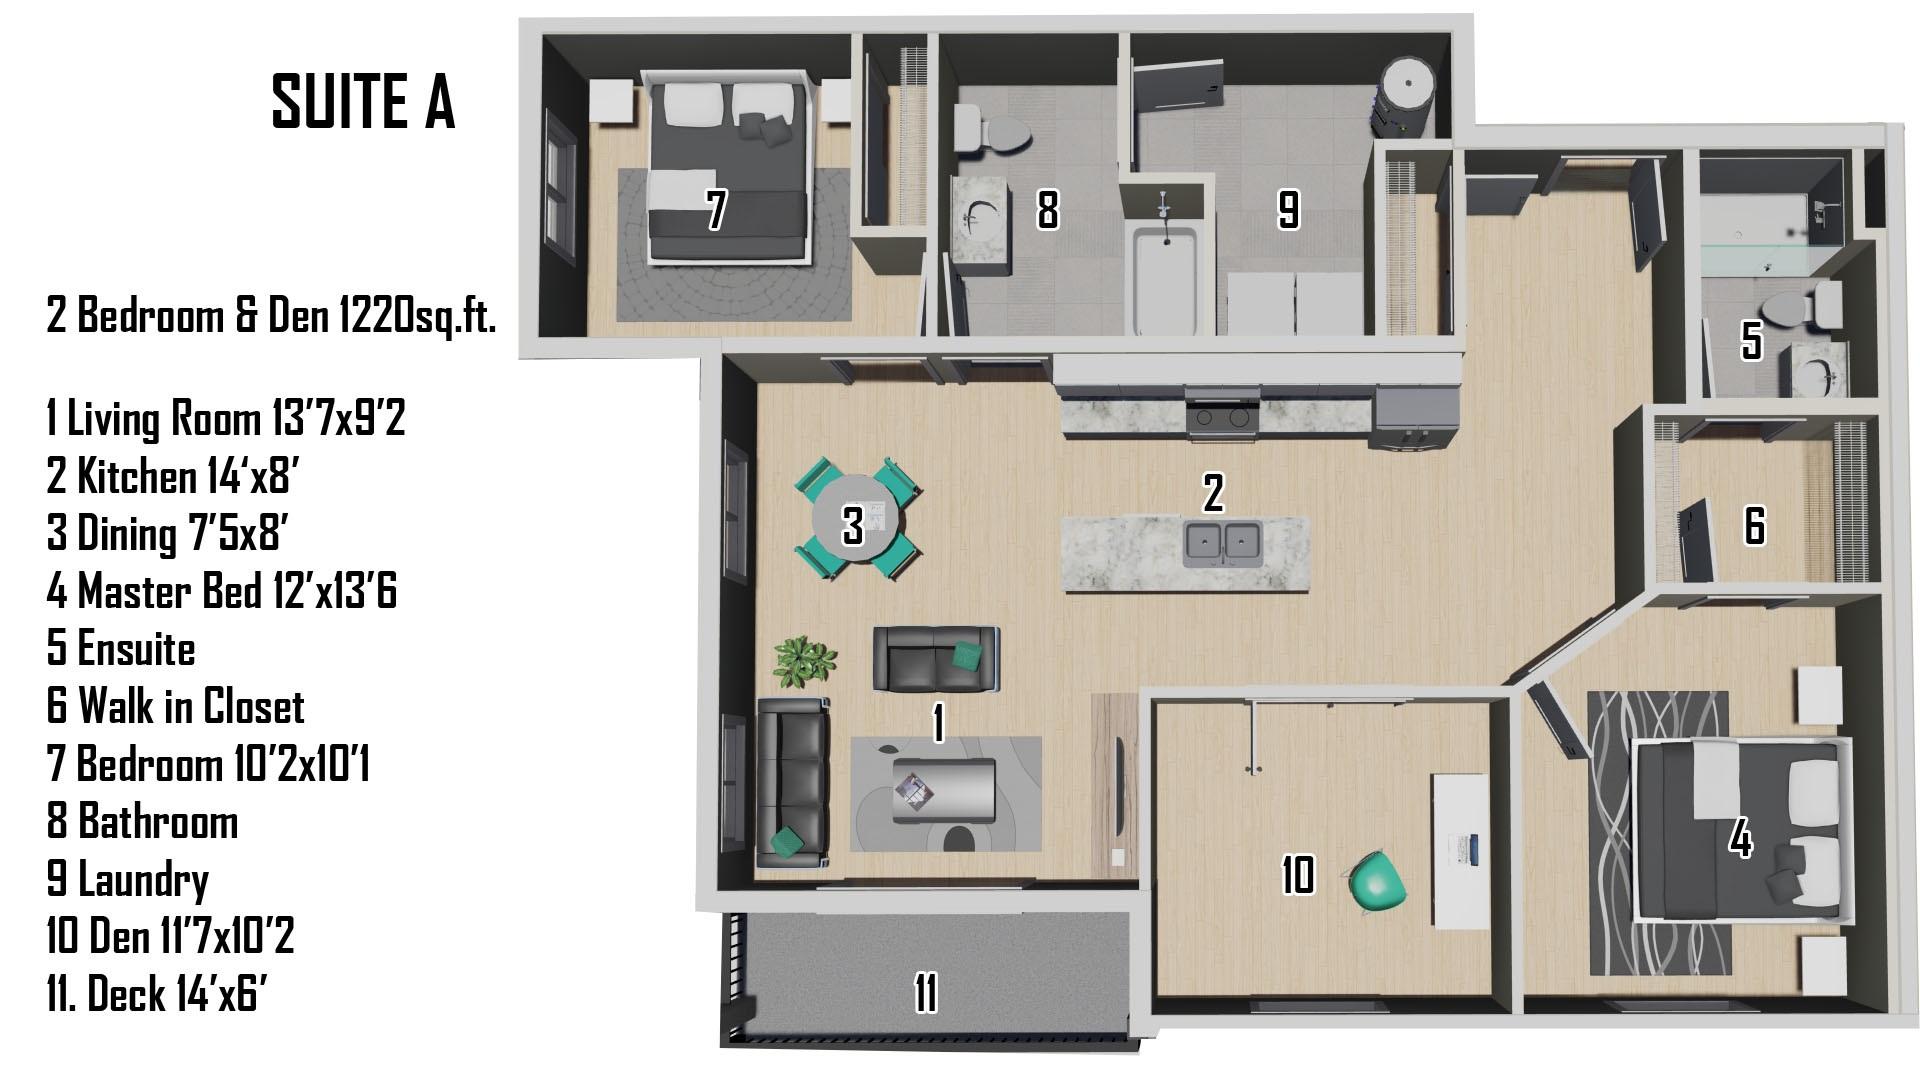 A Floorplan